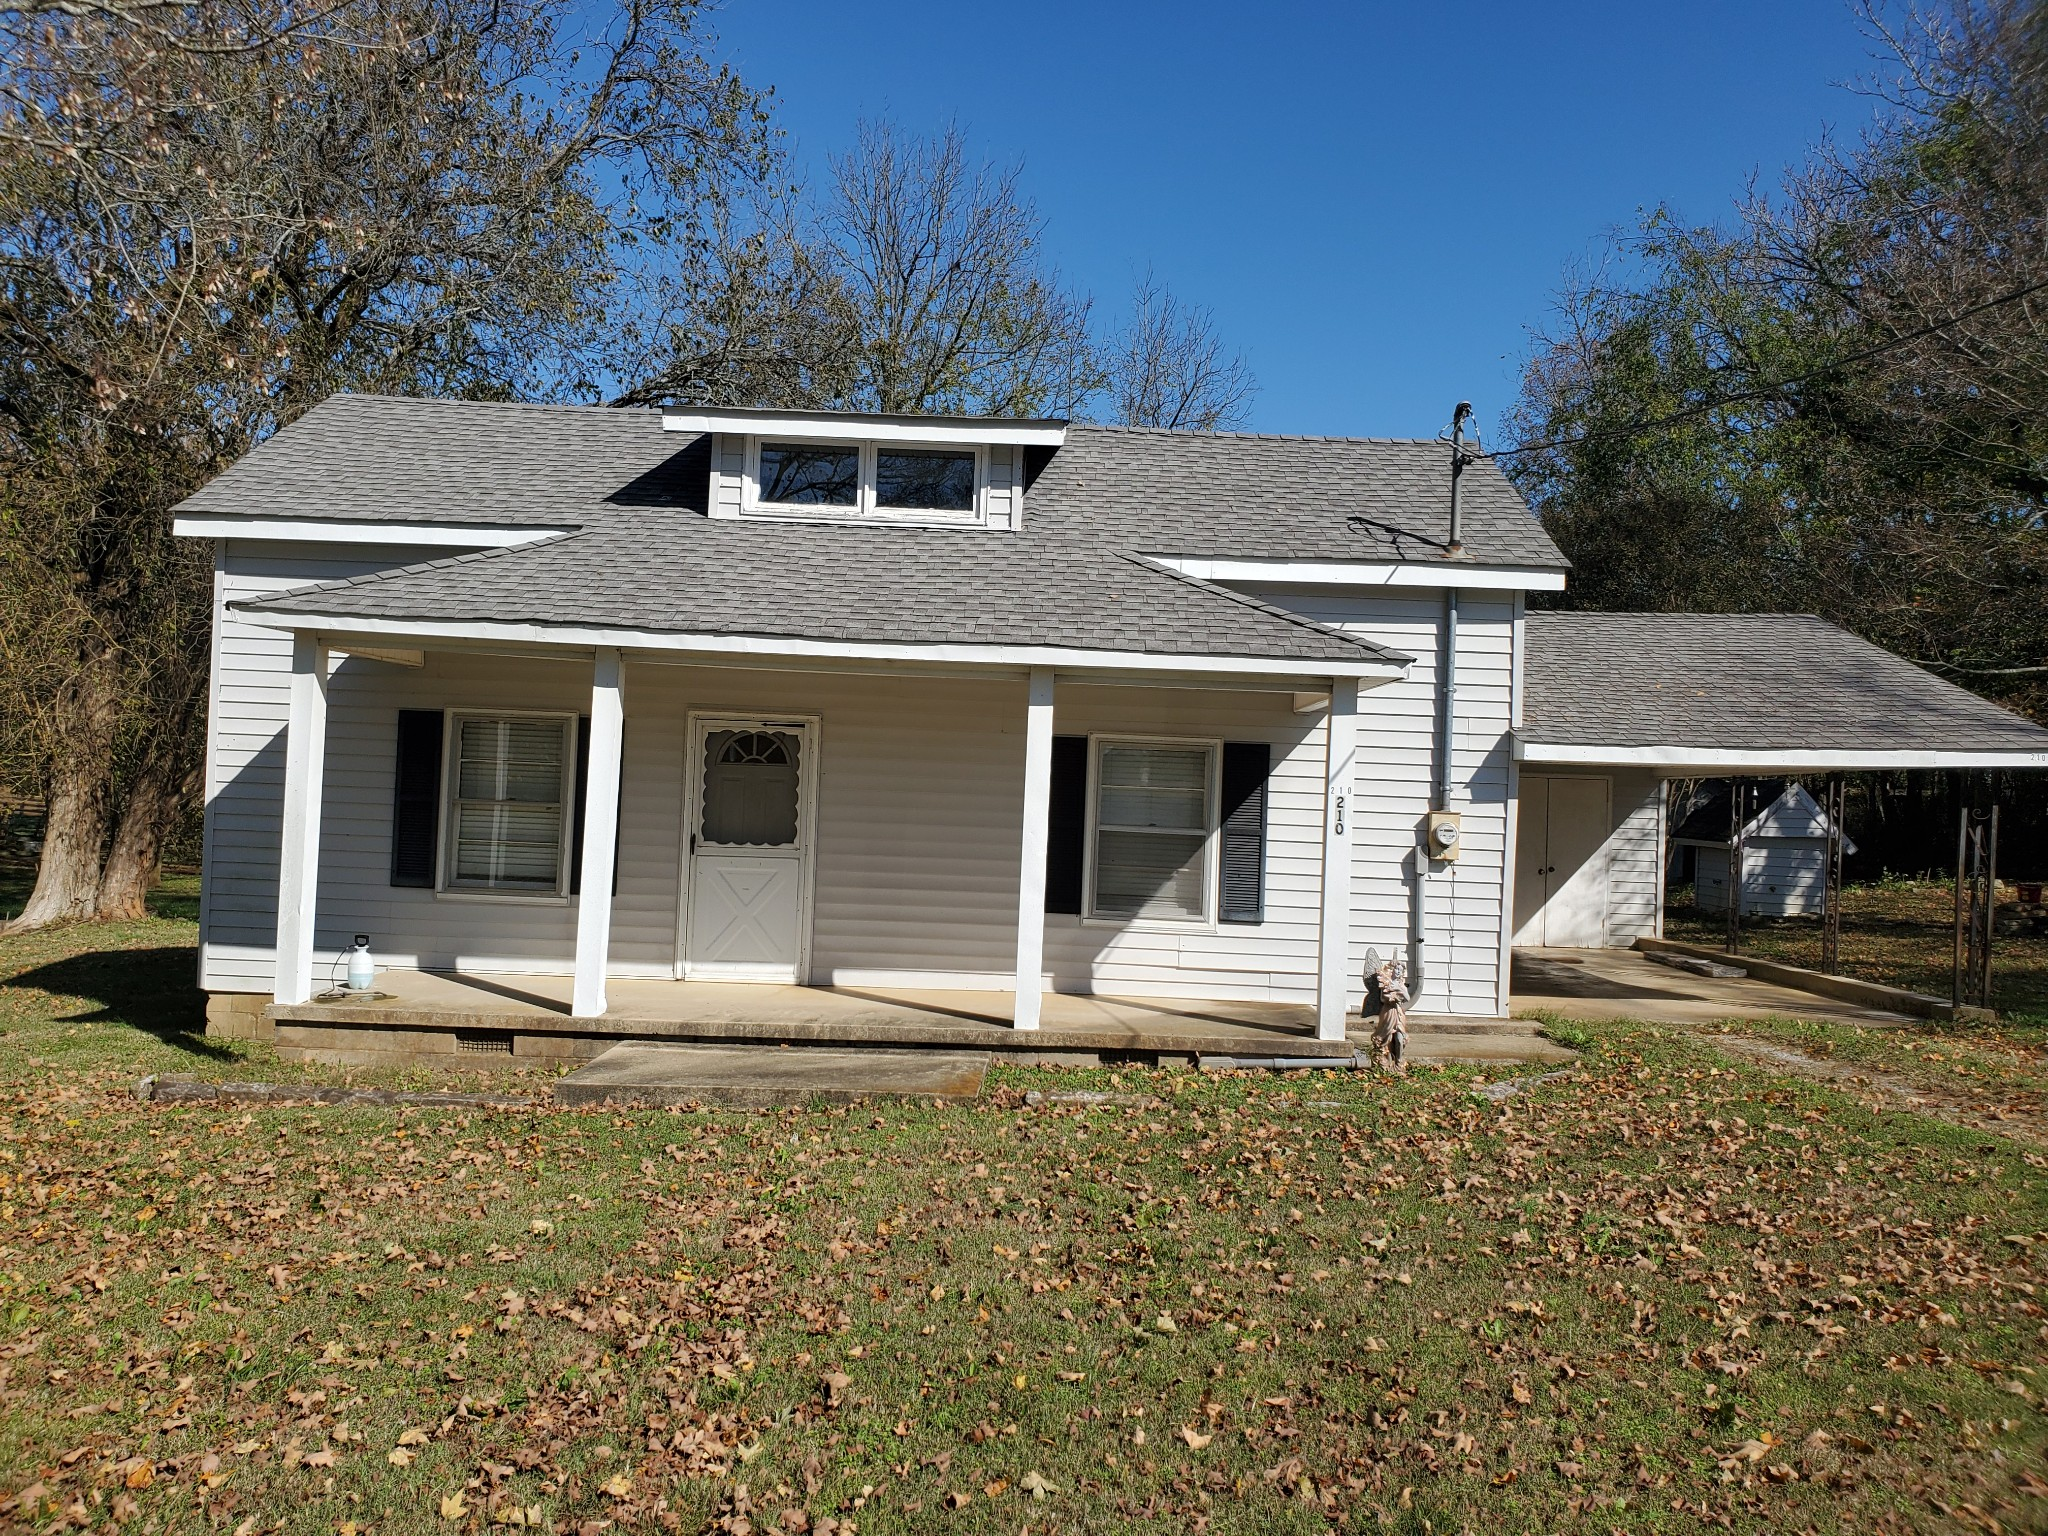 210 Old Rover Rd, Rockvale, TN 37153 - Rockvale, TN real estate listing